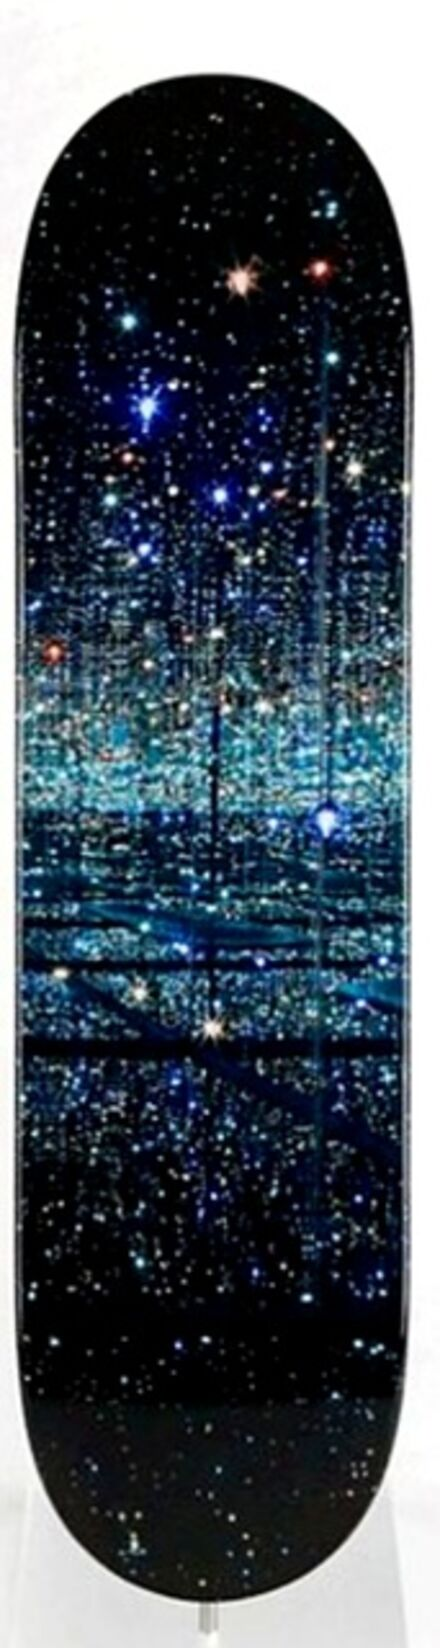 Yayoi Kusama, 'The Souls of Millions of Light Years Away (Infinity Mirror) Skate Deck', 2013